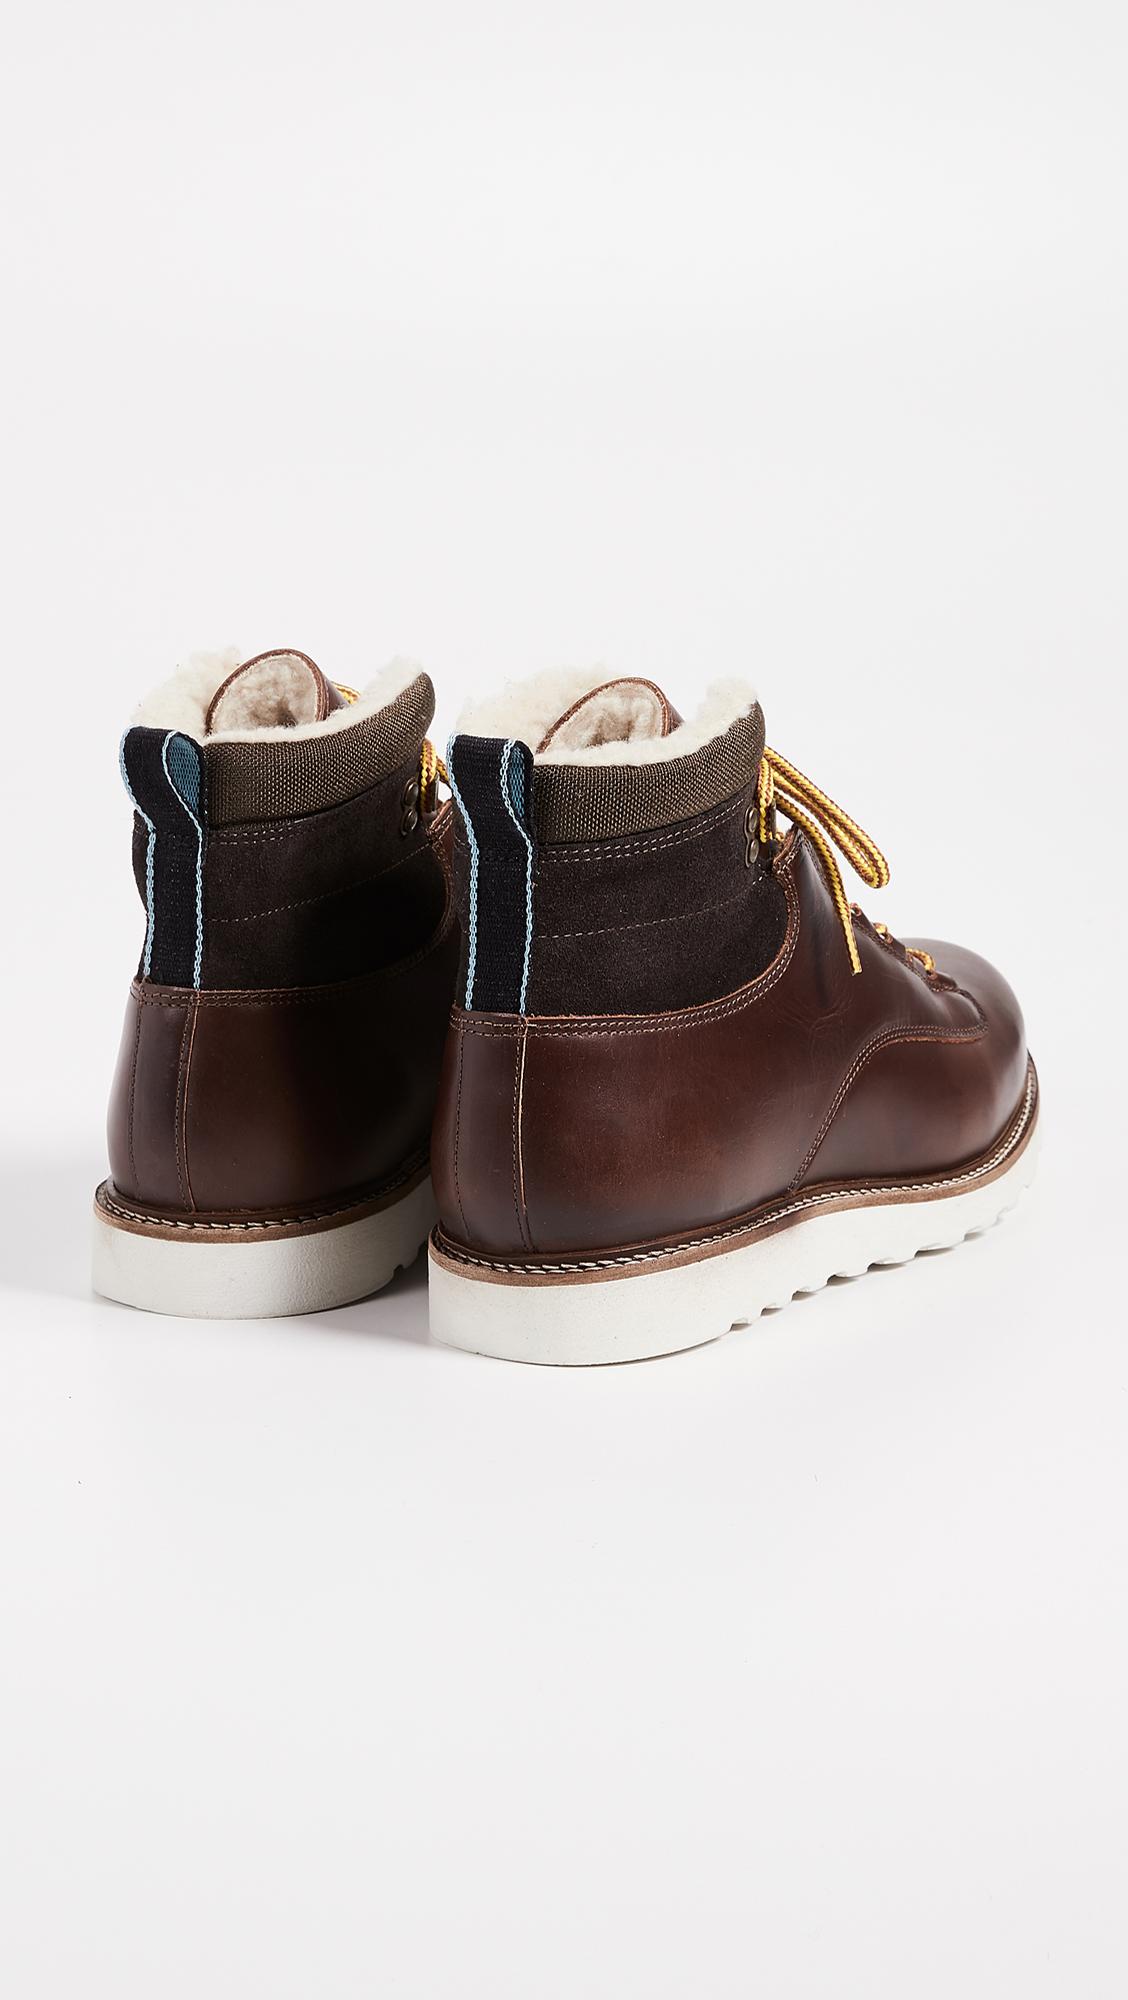 Hiker Bear Leather Dane Shoe BootsEast The Tenzing 0yvnwm8NO